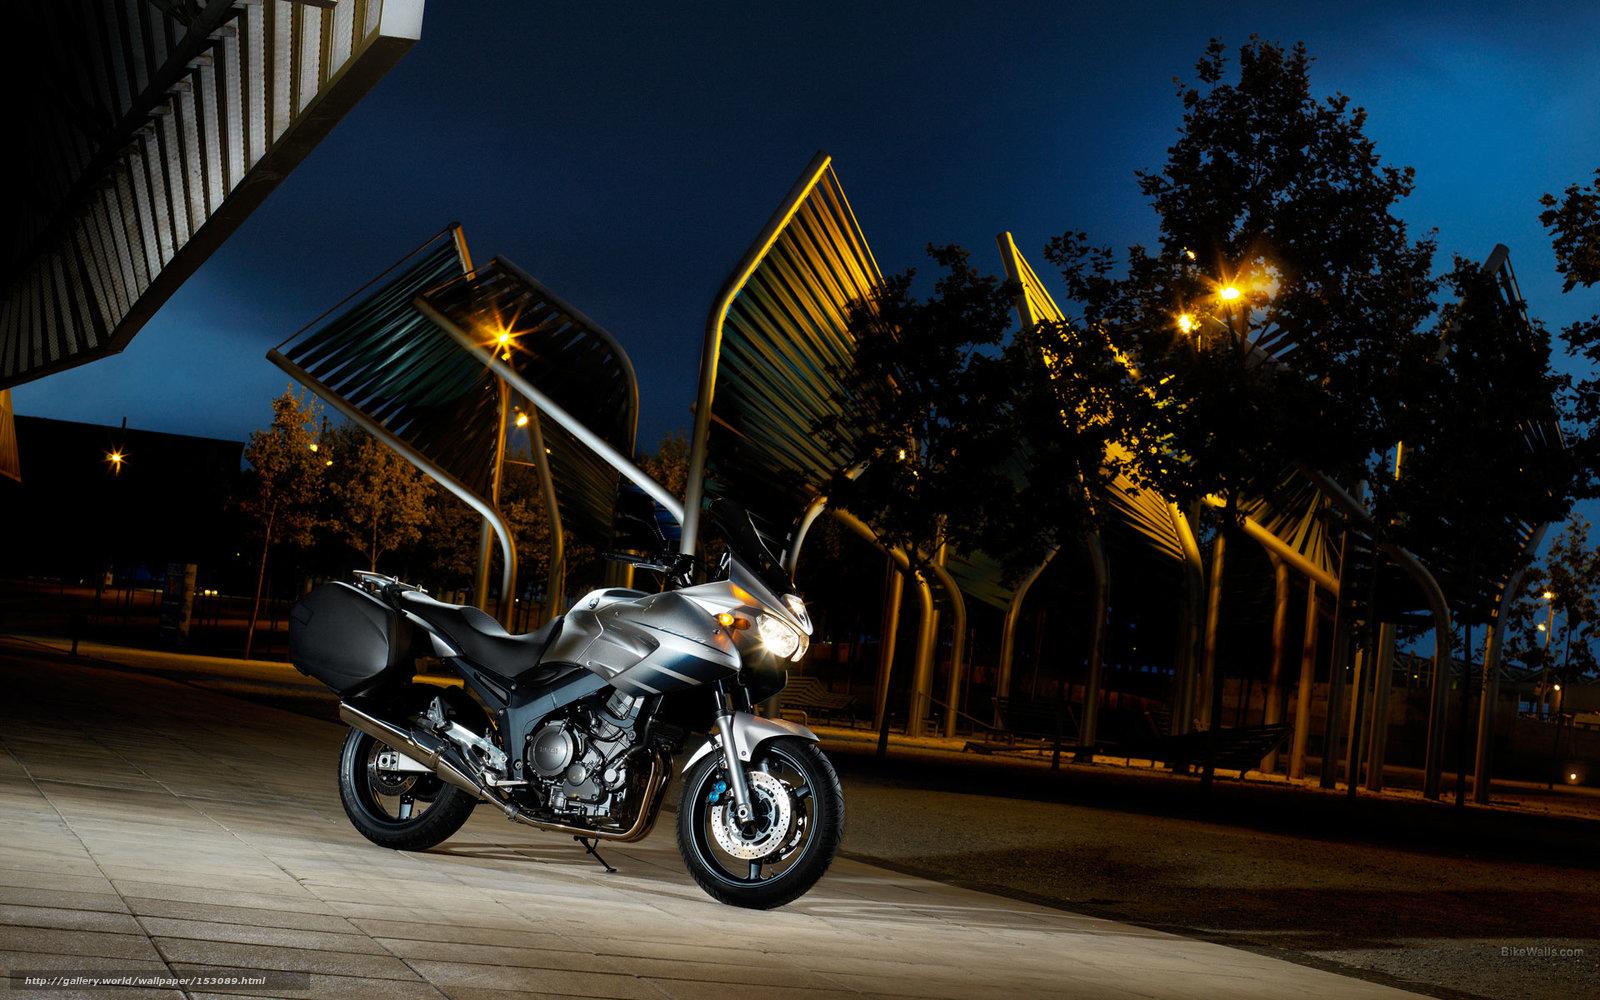 Yamaha trx850 as well Watch further Yamaha Tdm 900 furthermore Index besides Watch. on yamaha tdm